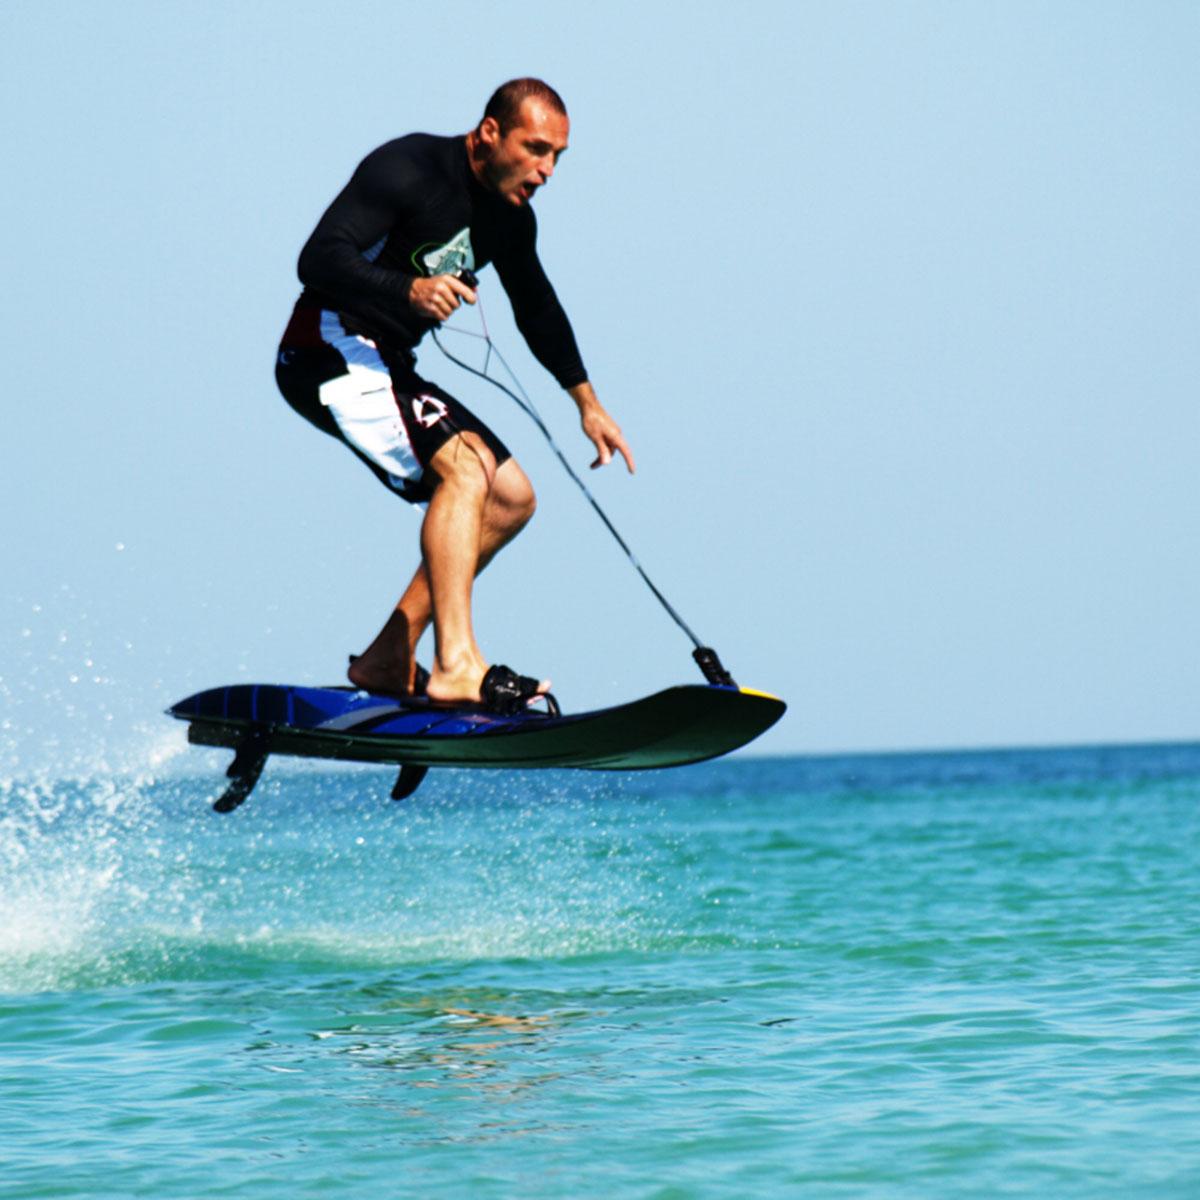 Surf Balance Board Nz: Carbon Fibre Board Powered By 100cc Engine